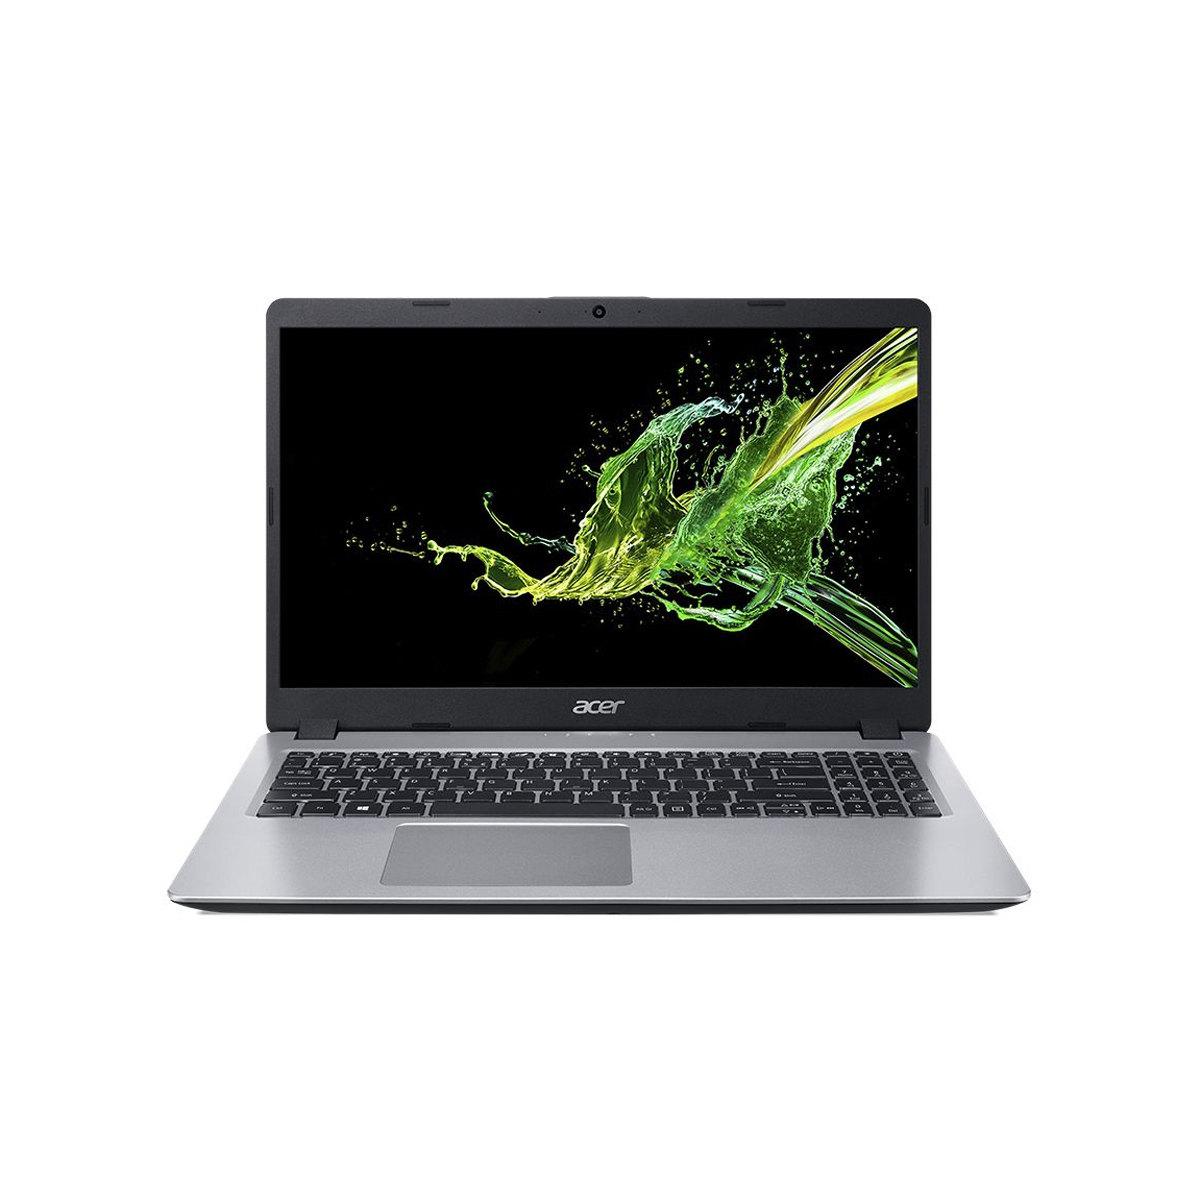 Notebook Acer A515 Core I5 8265u Memoria 4gb Ddr4 Hd 1tb Ssd 240gb Tela 15.6' Led Hd Sistema Windows 10 Home